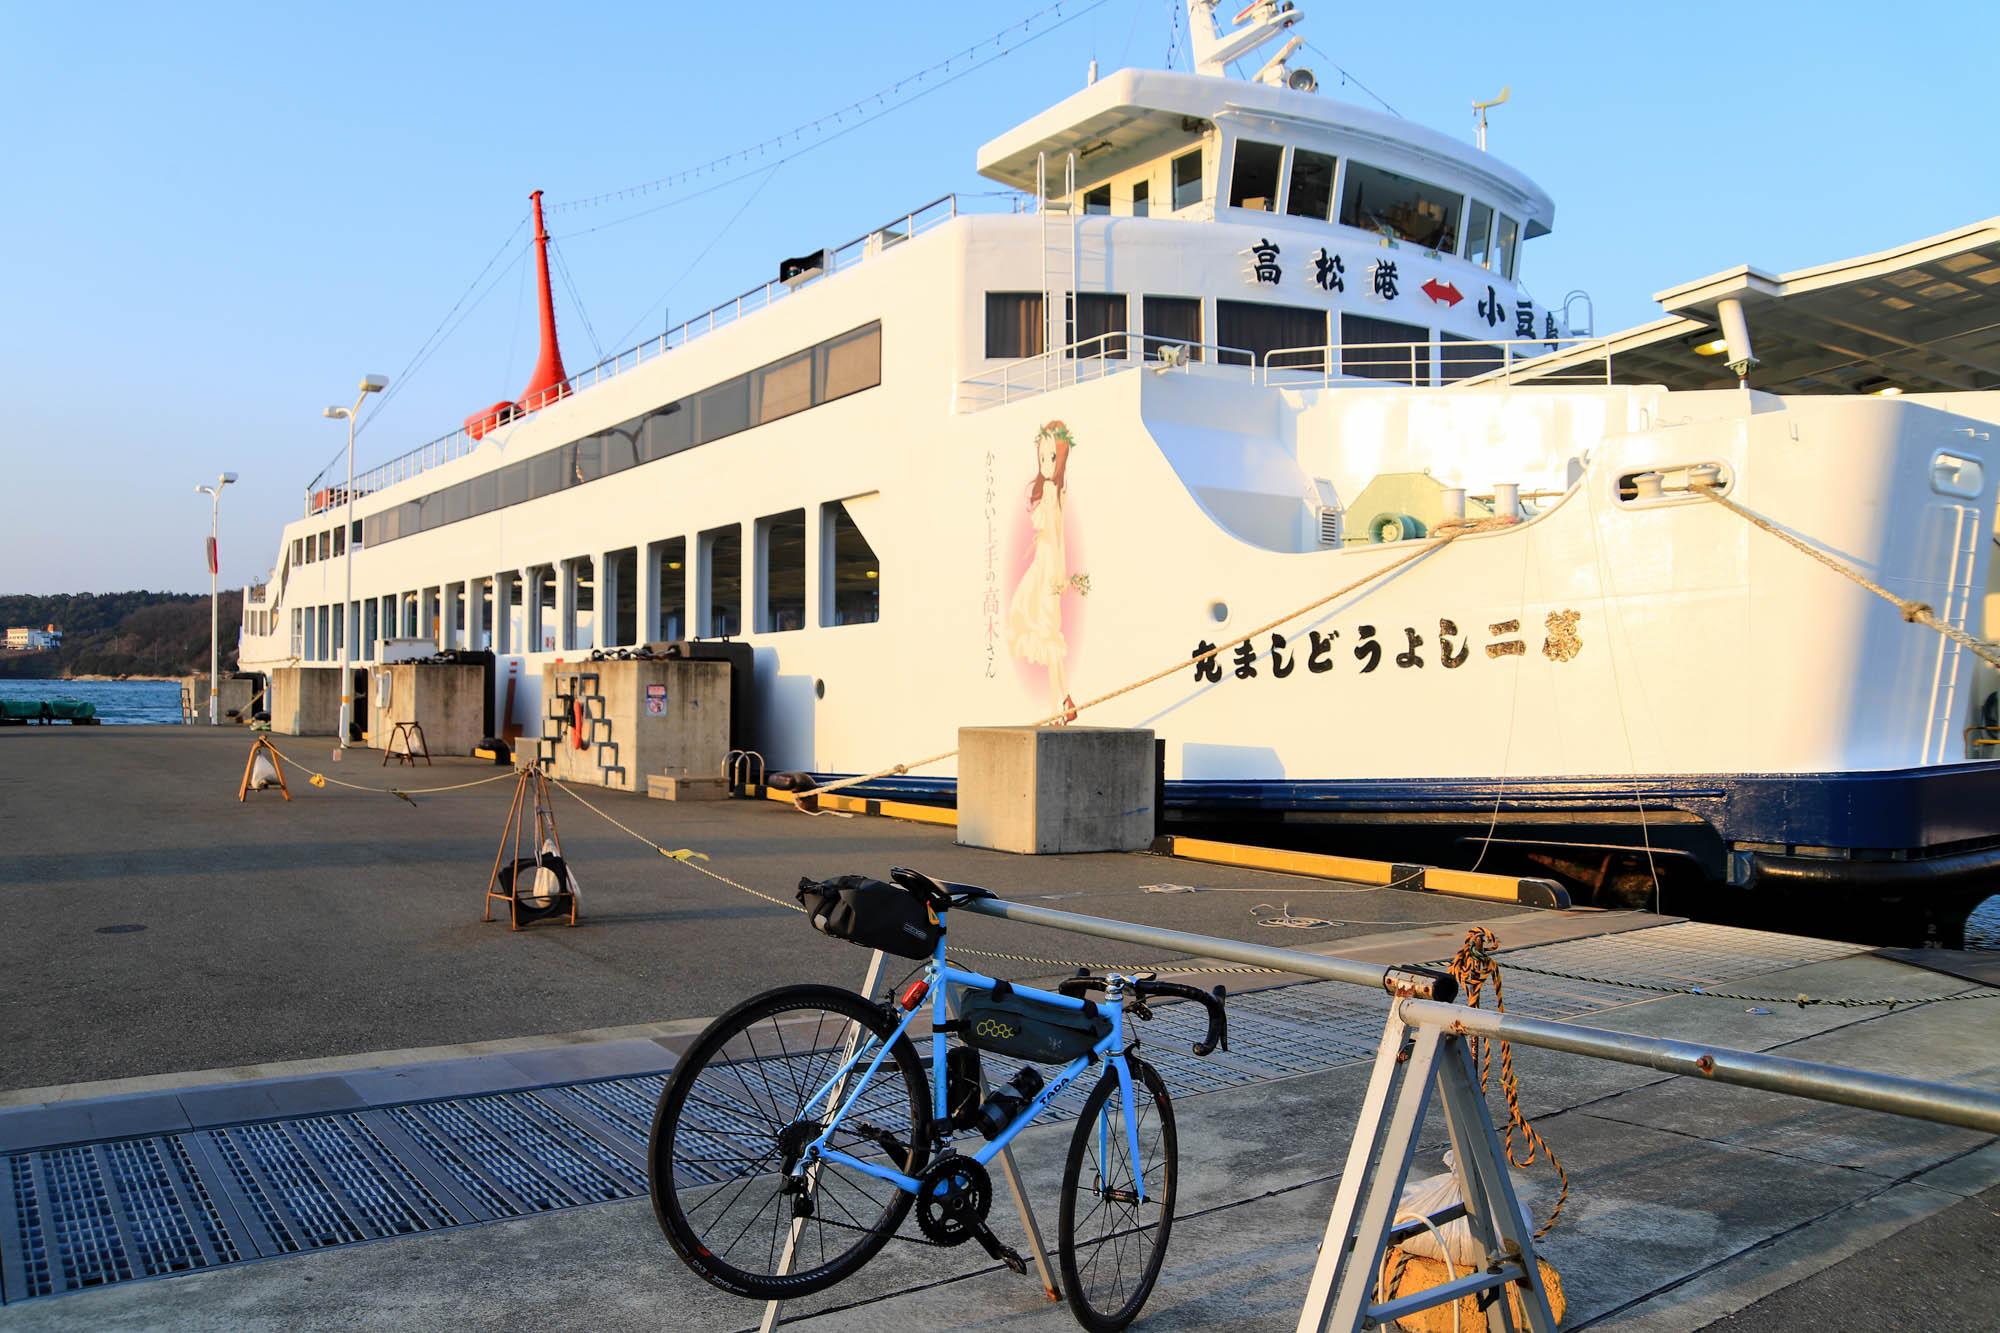 takagisan_ferry-15.jpg